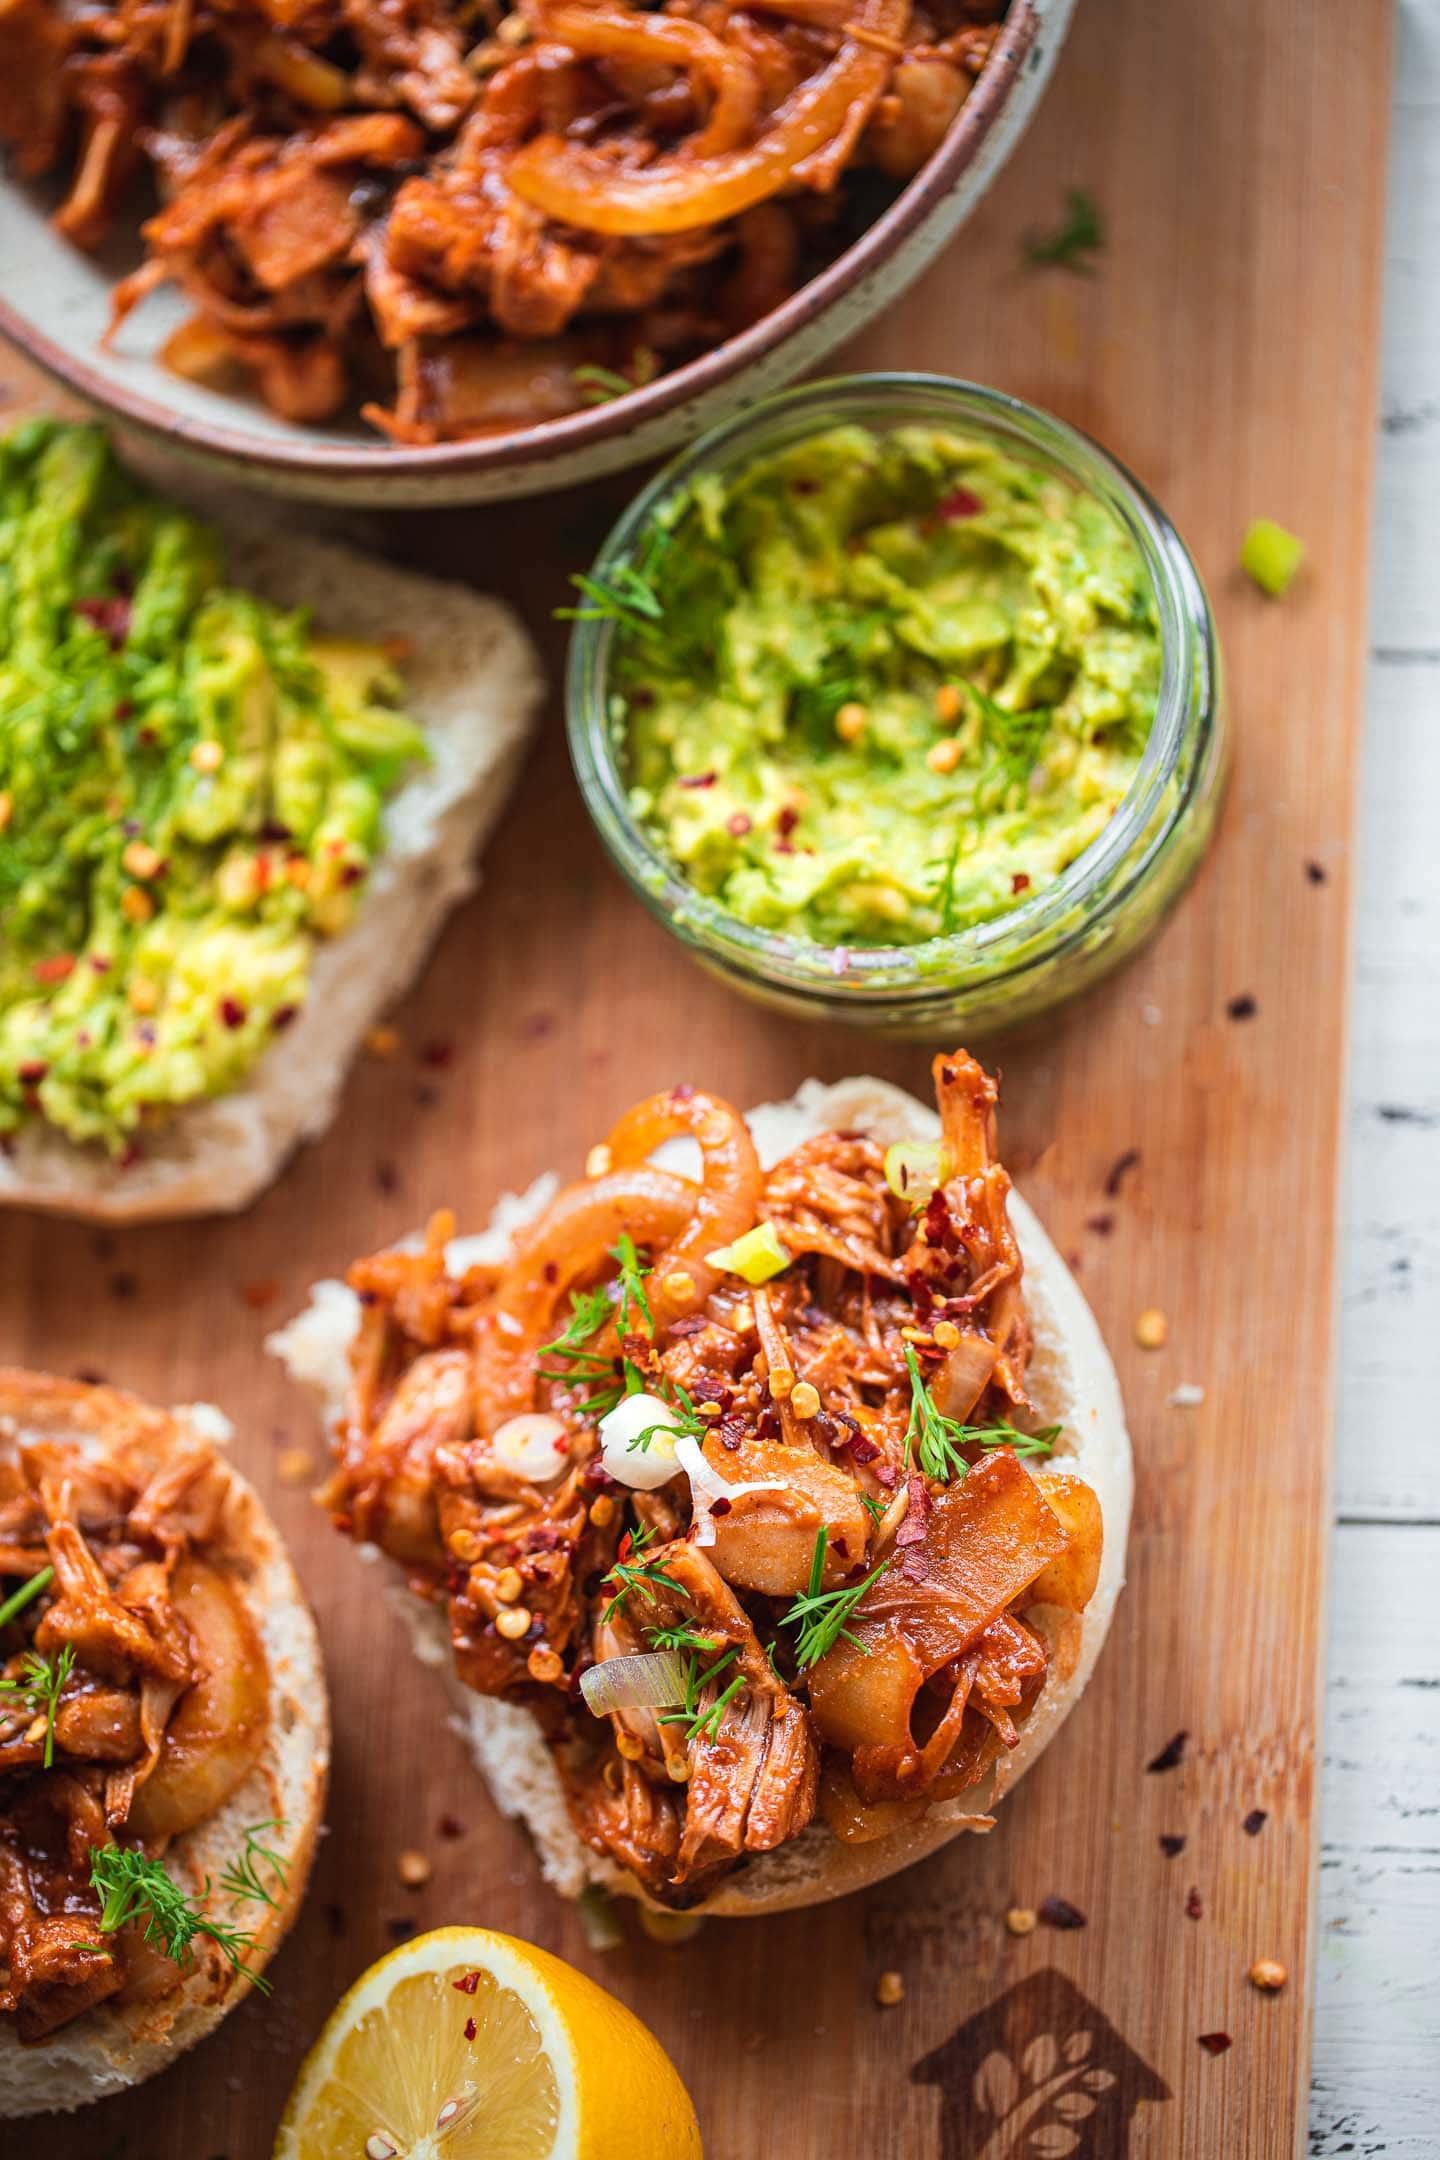 Vegan pulled jackfruit sandwiches with avocado